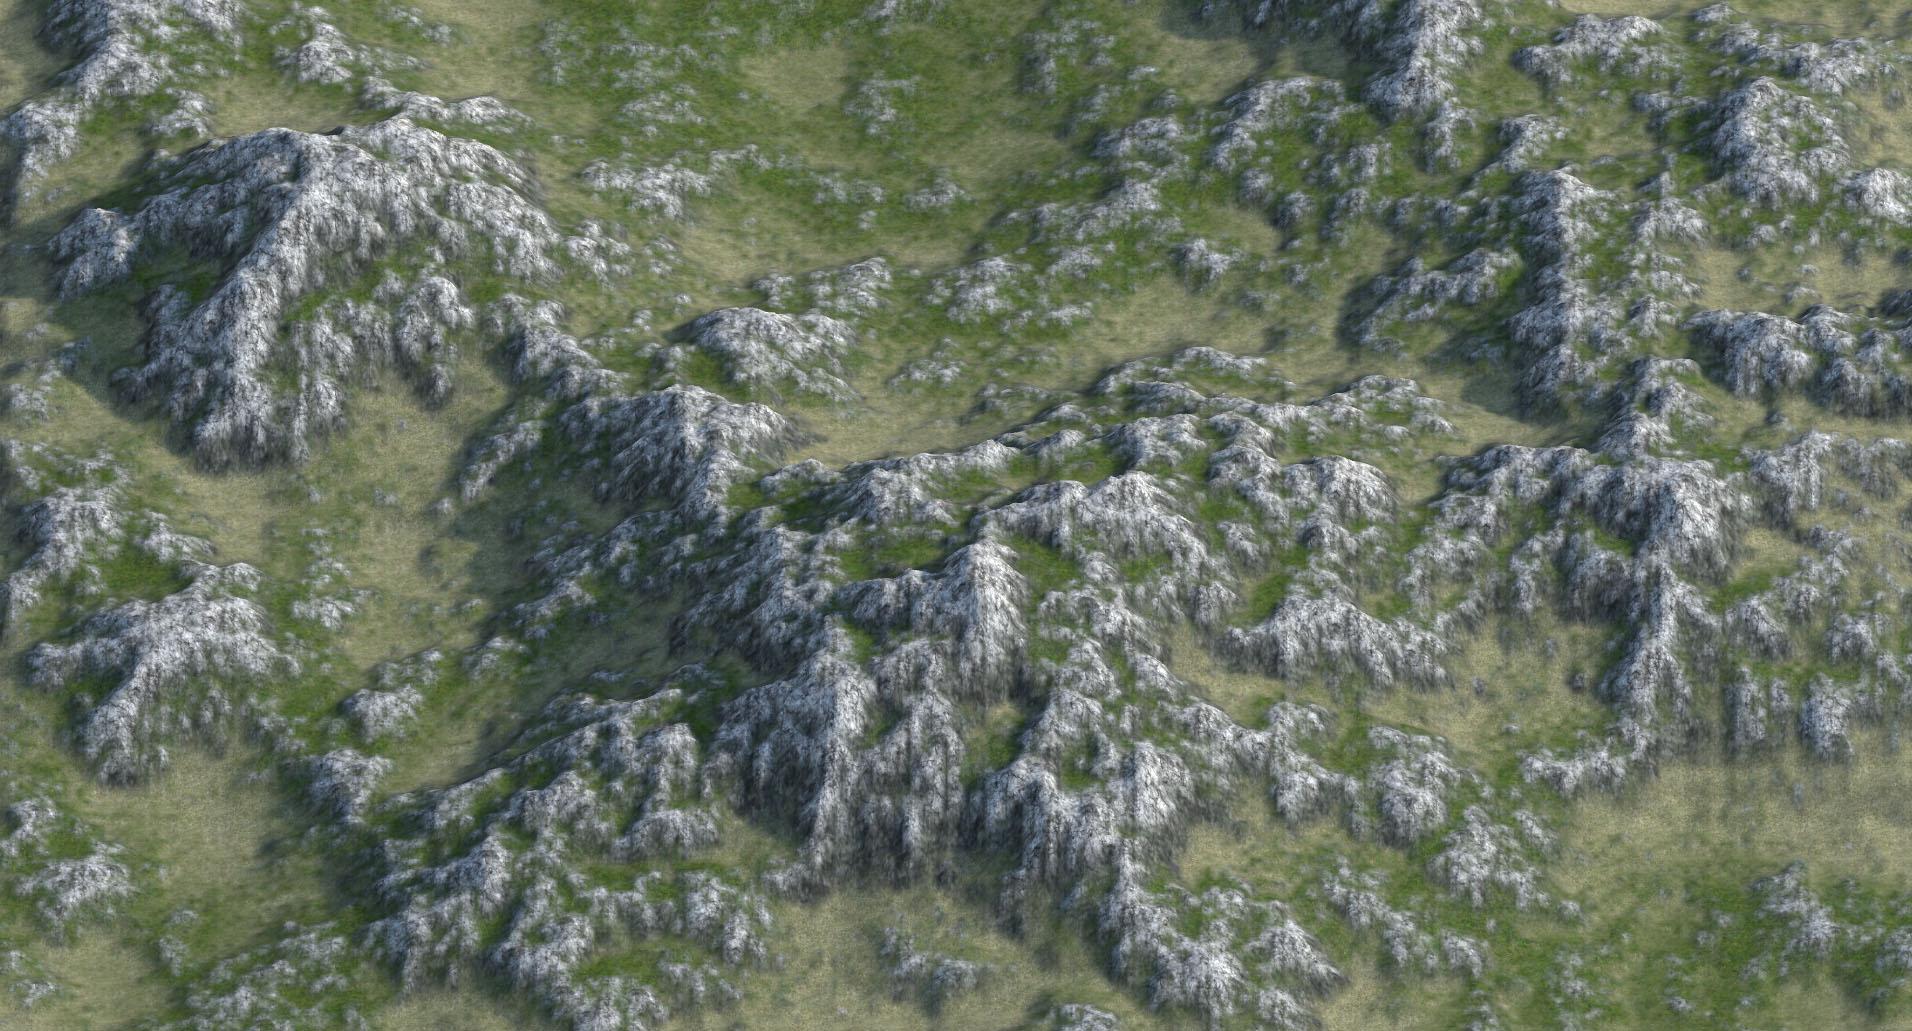 terrain.jpg